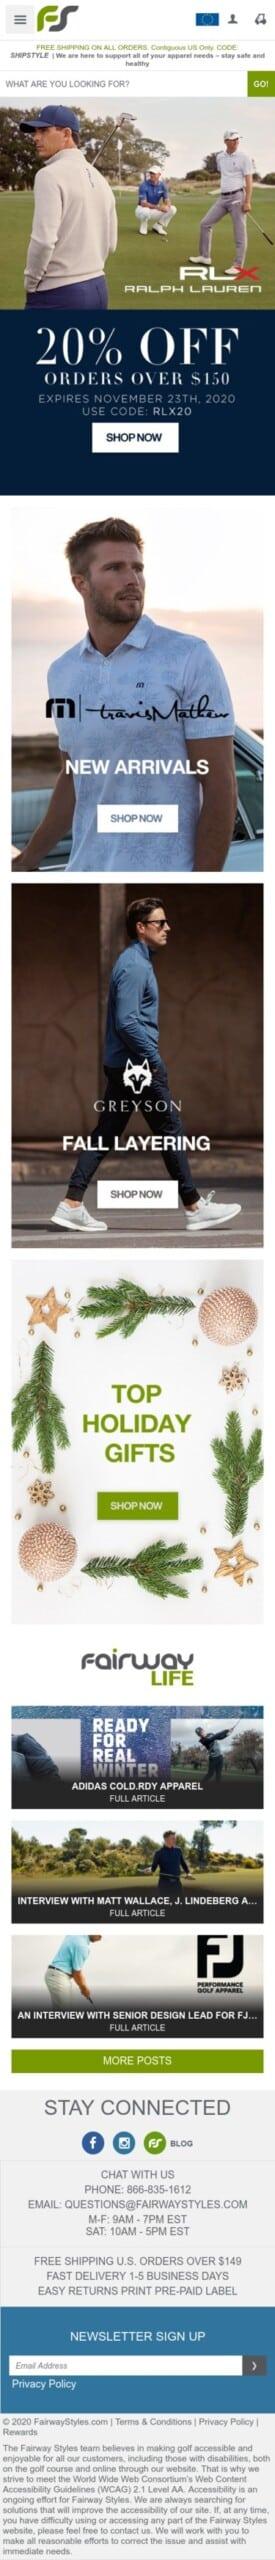 Global Value - FairwayStyles: fairway styles Coupon